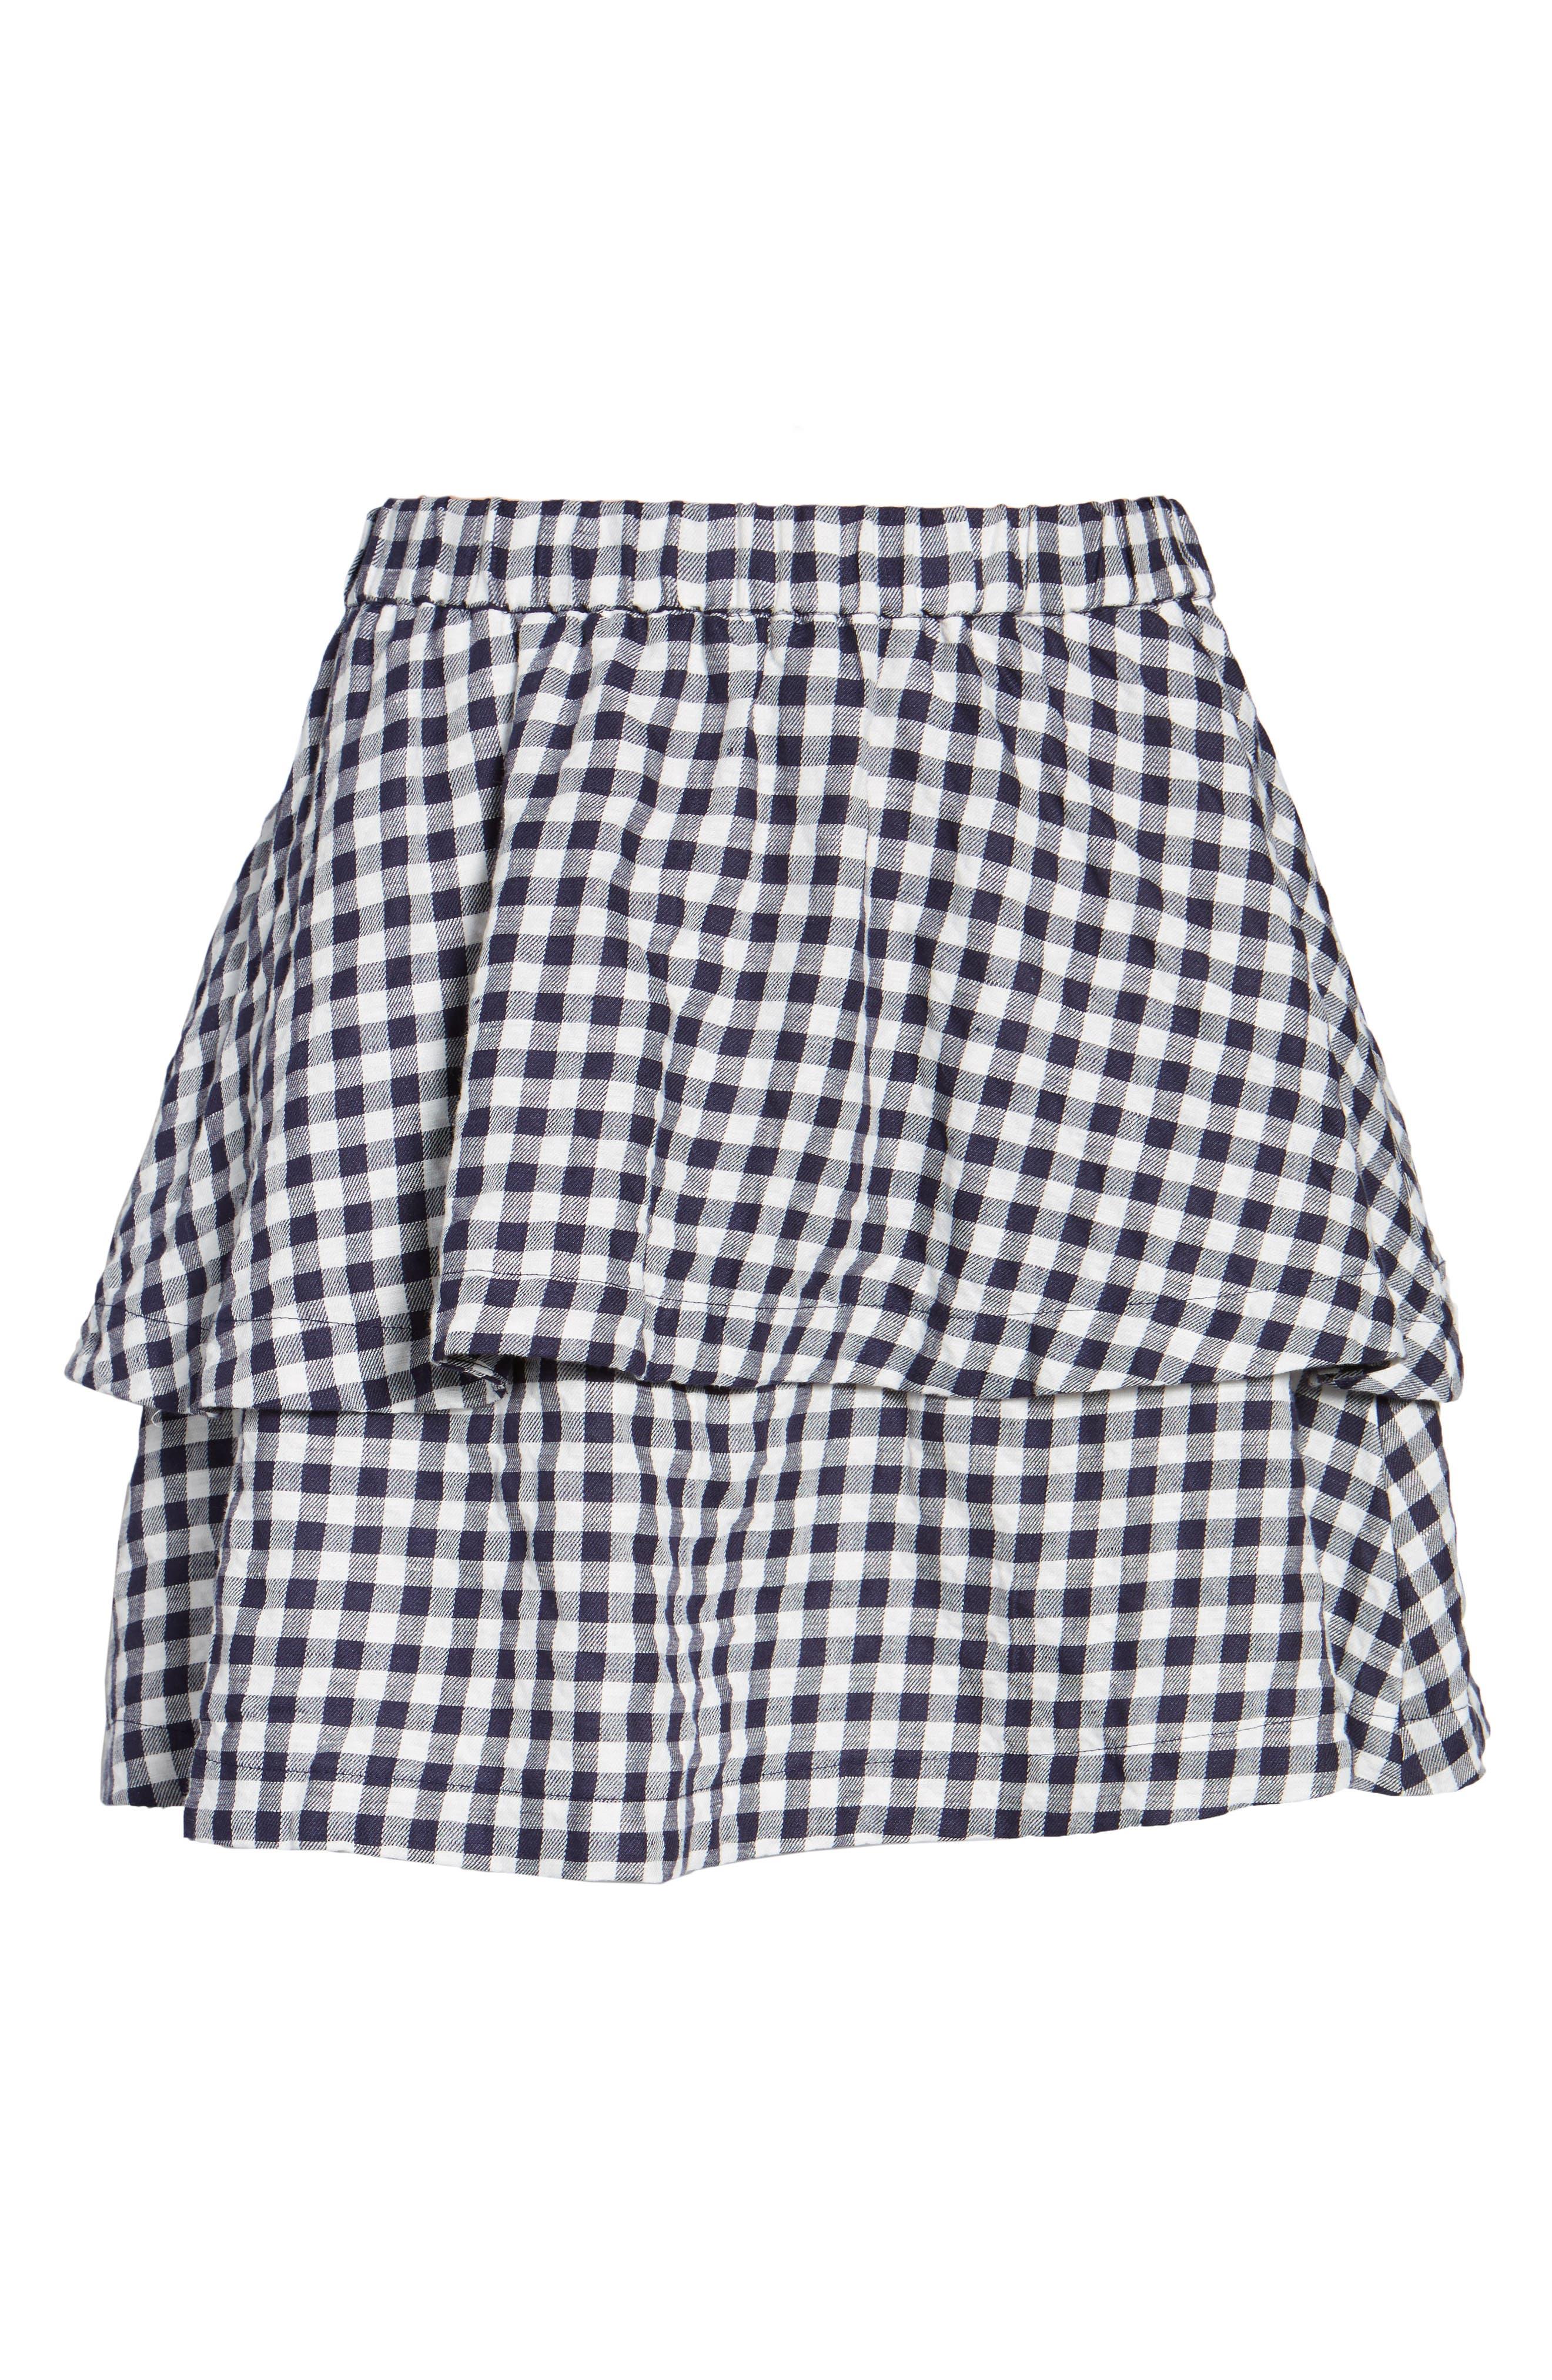 Gingham Tiered Miniskirt,                             Alternate thumbnail 6, color,                             400